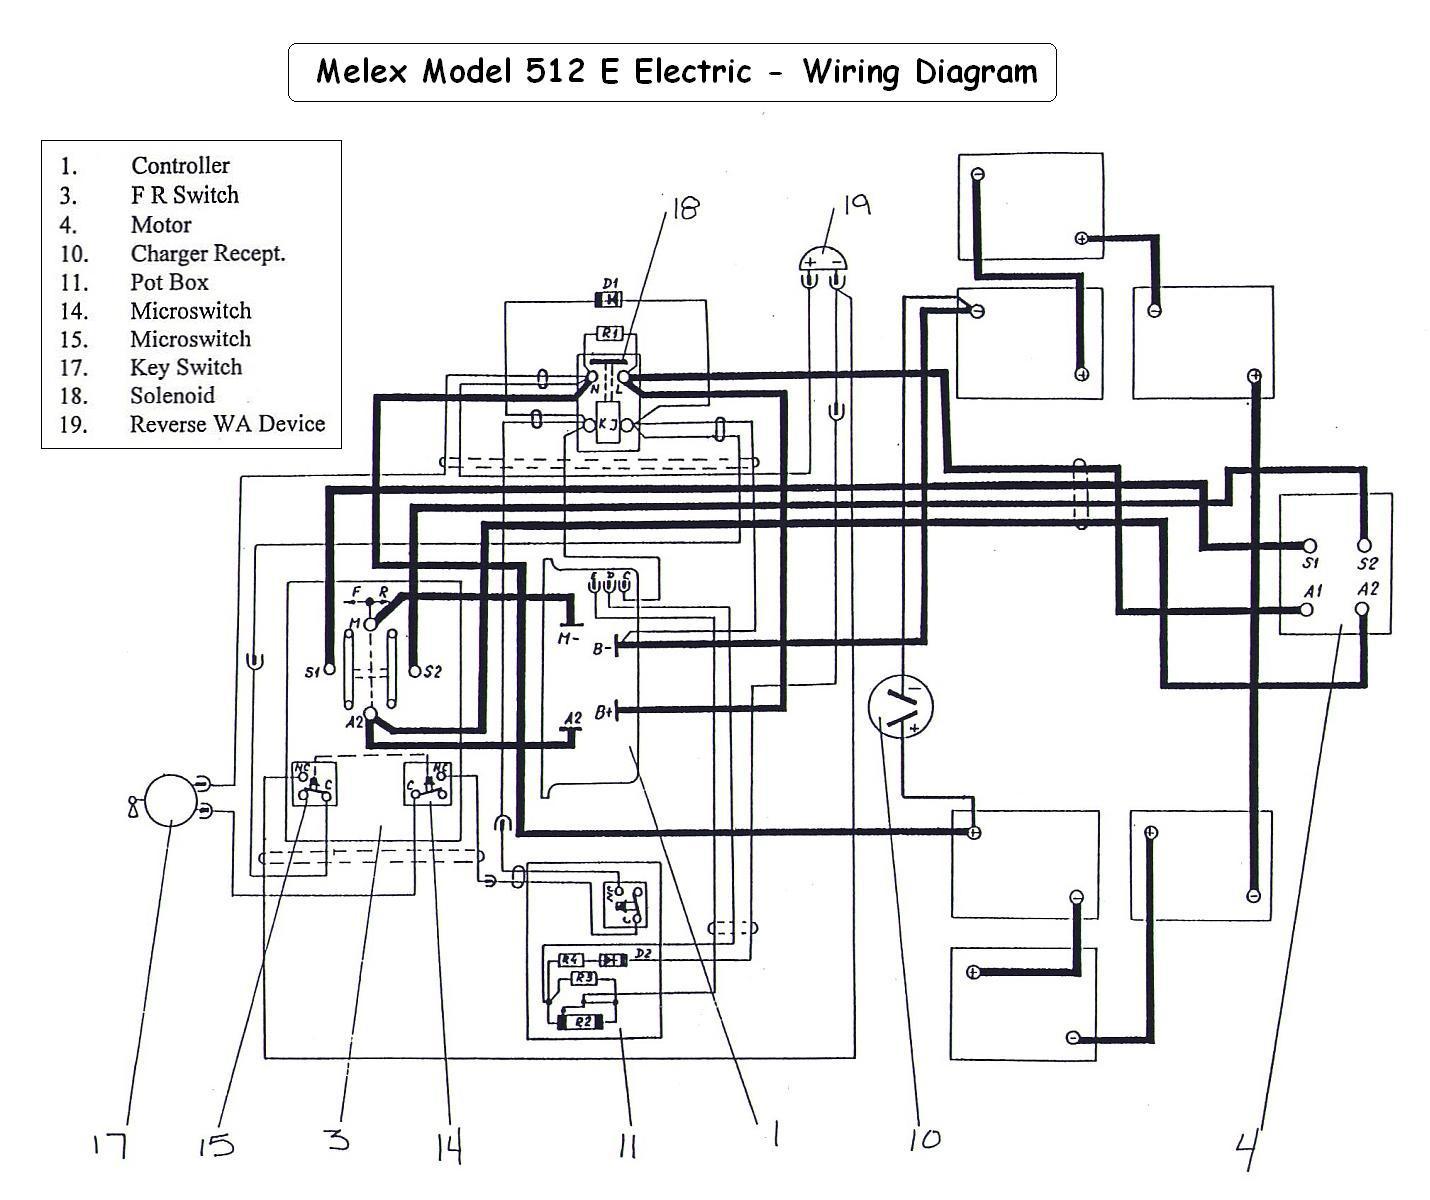 Wiring Diagram For 36 Volt Golf Cart | Manual E-Books - Golf Cart Wiring Diagram